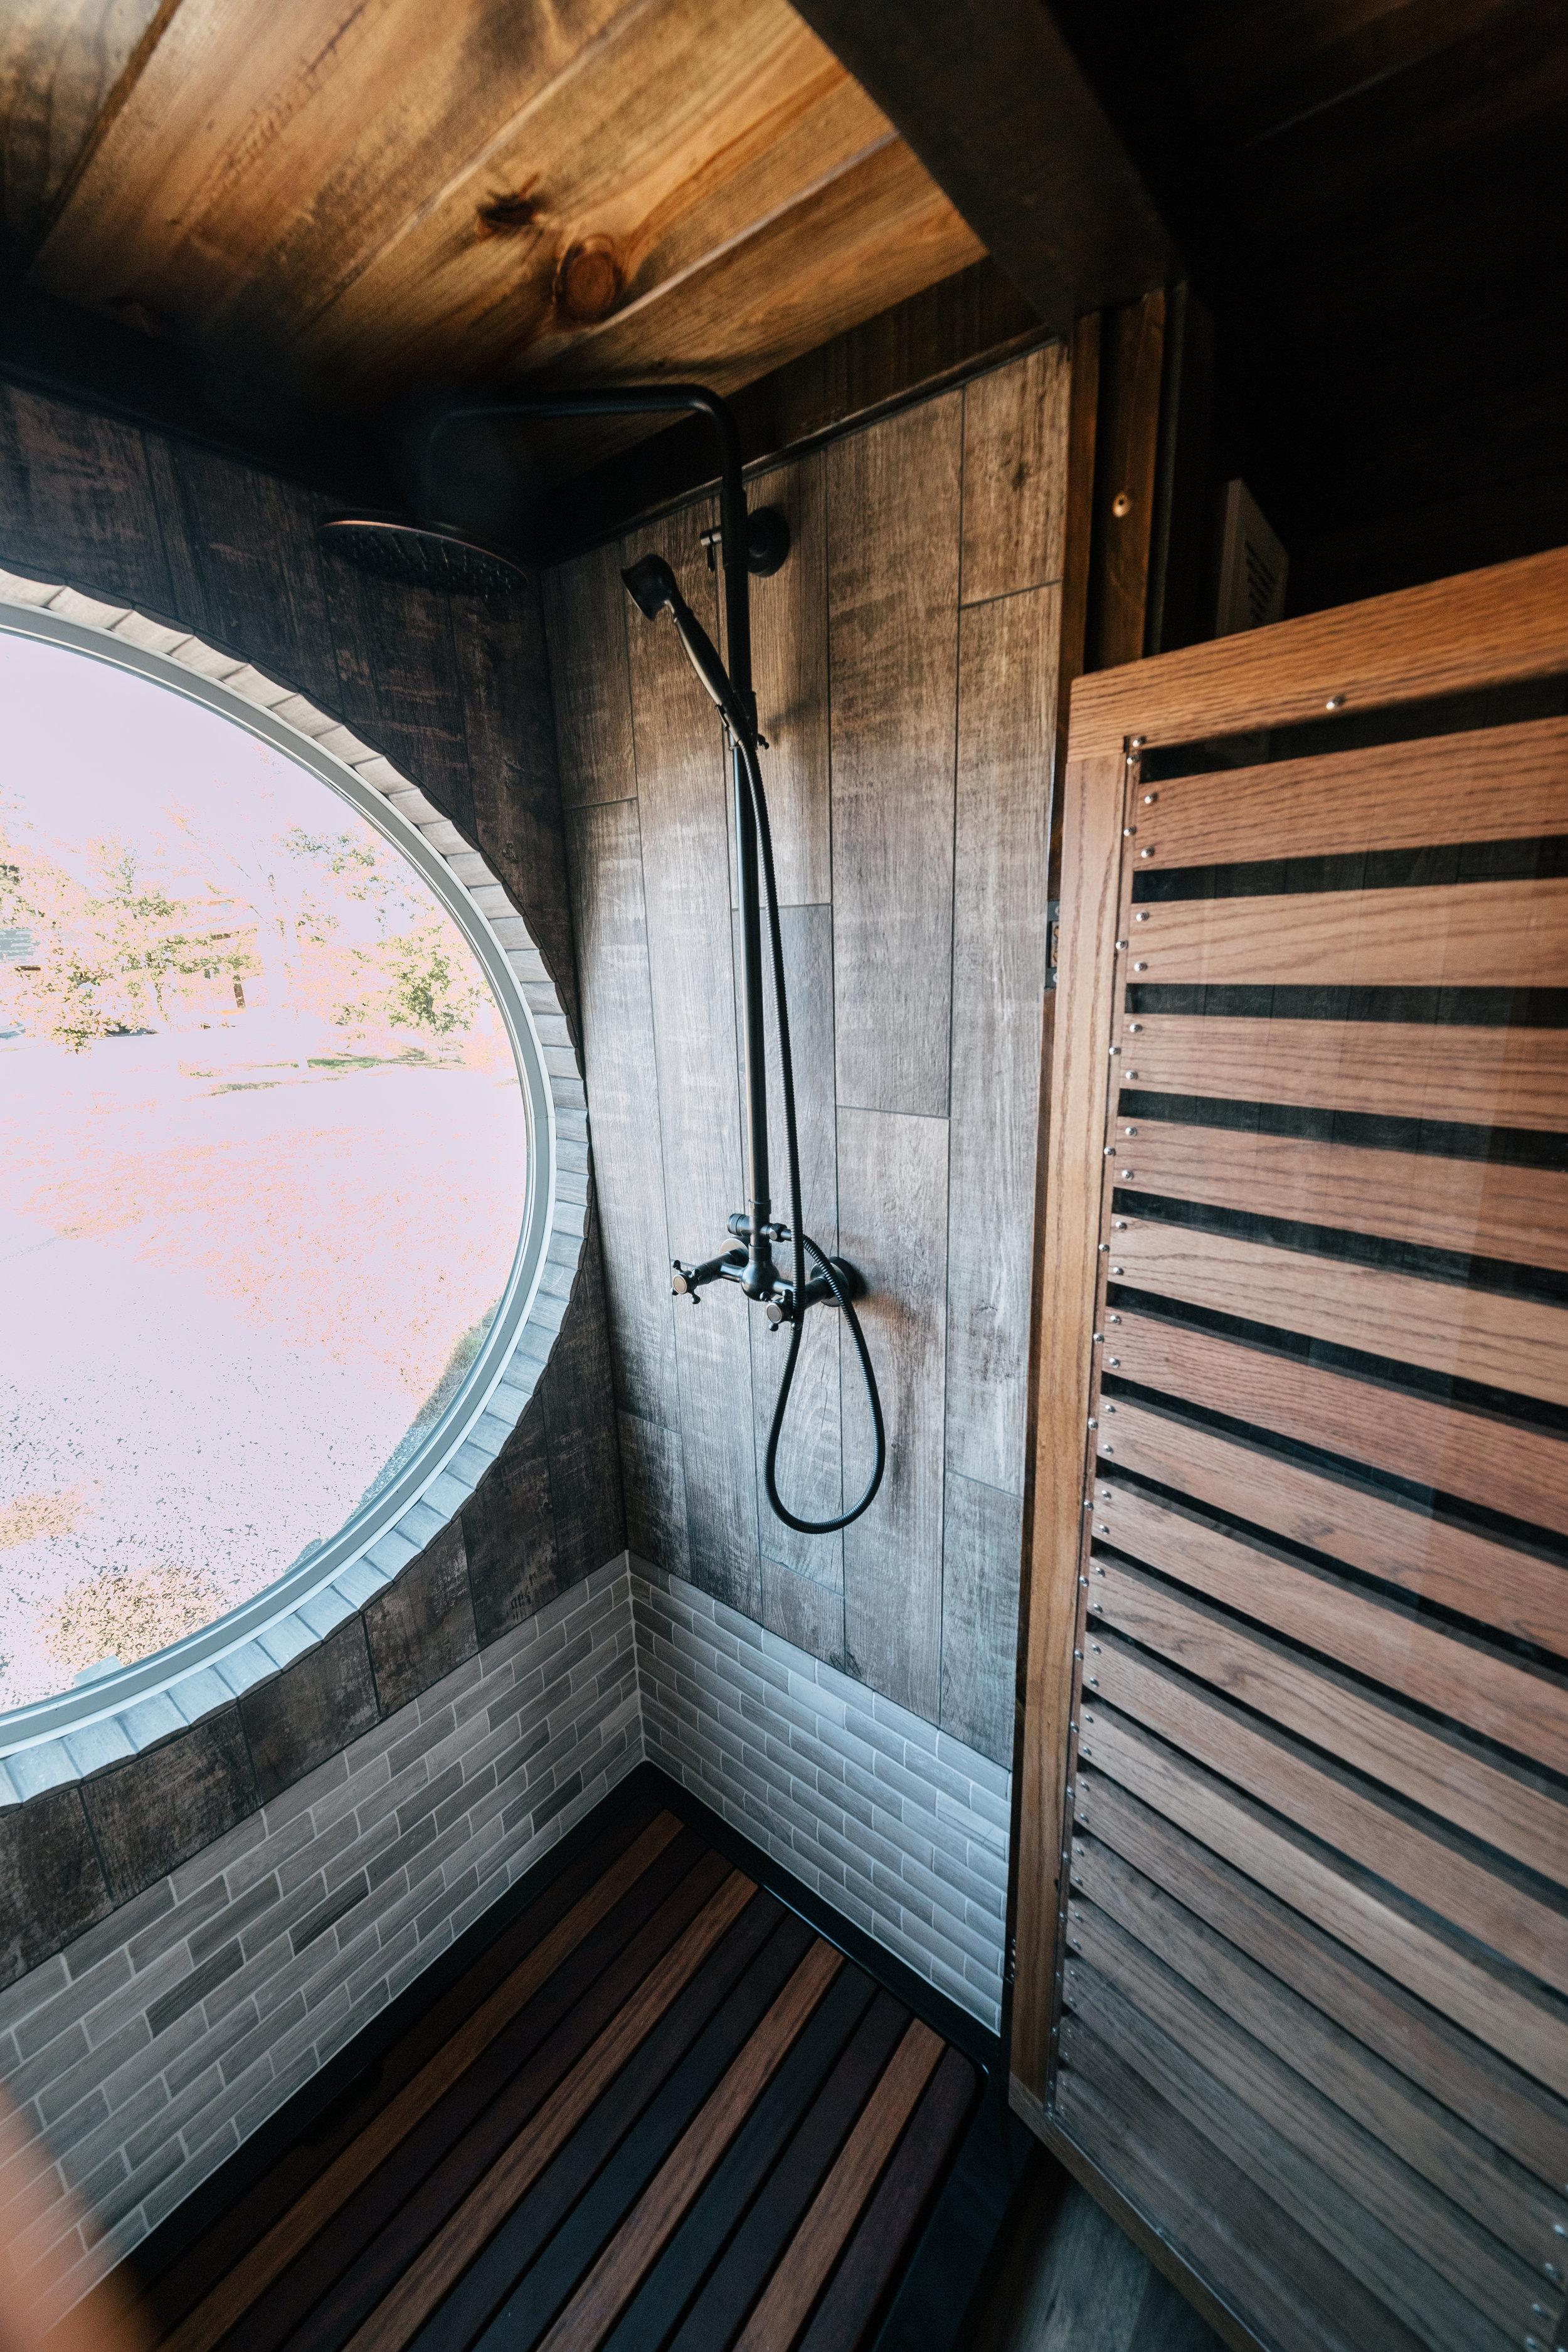 The Silhouette by Wind River Tiny Homes -oak wood slat/Plexiglass shower stall doors, limestone tile, faux wood tile, oil rubbed bronze rain shower head with handheld, cumaru wood shower deck insert